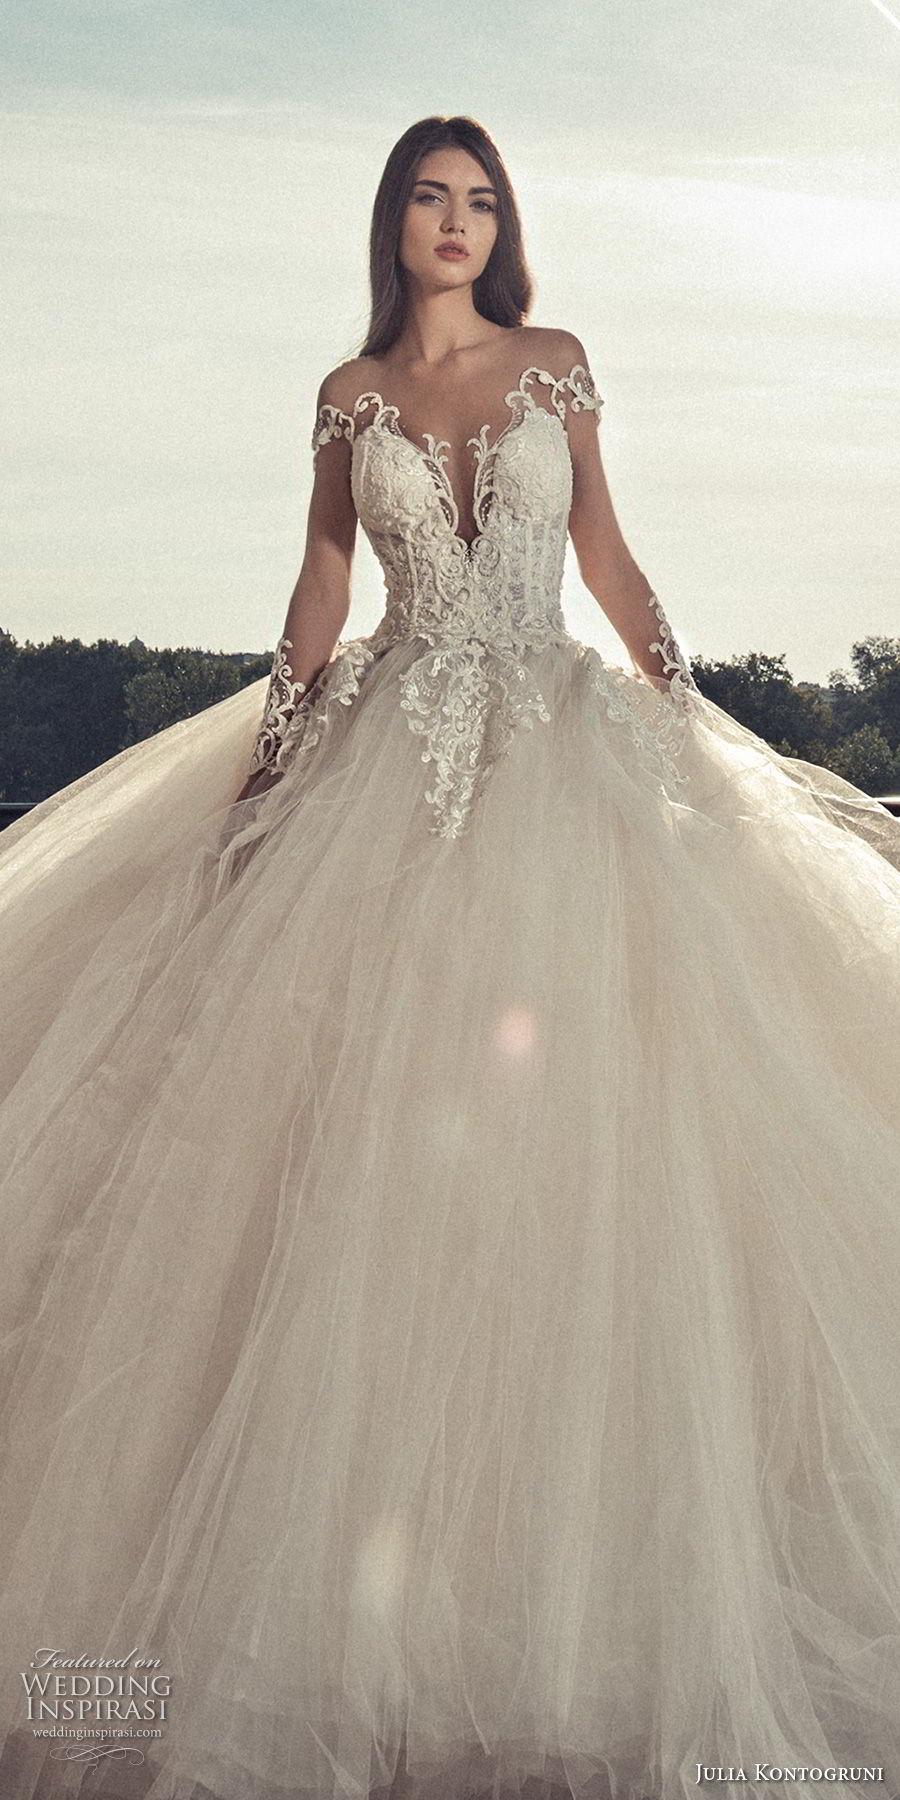 julia kontogruni 2018 bridal long sleeves deep plunging v neck heavily embellished bodice princess ball gown wedding dress open back royal train (2) zv